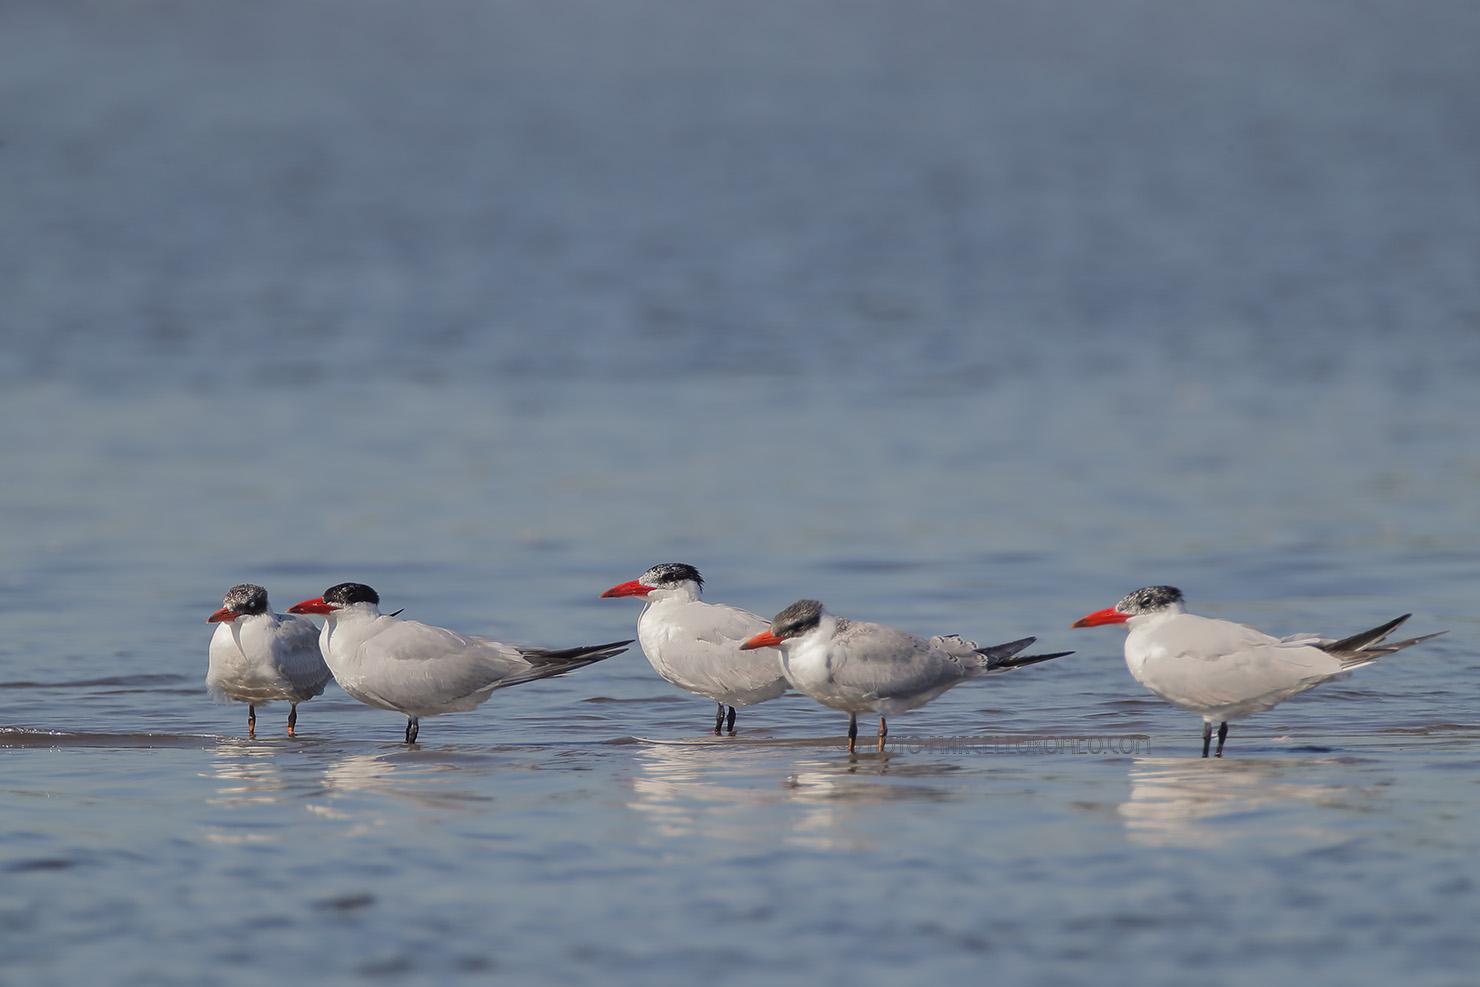 Reuzenstern; Caspian Tern; Hydroprogne Caspia